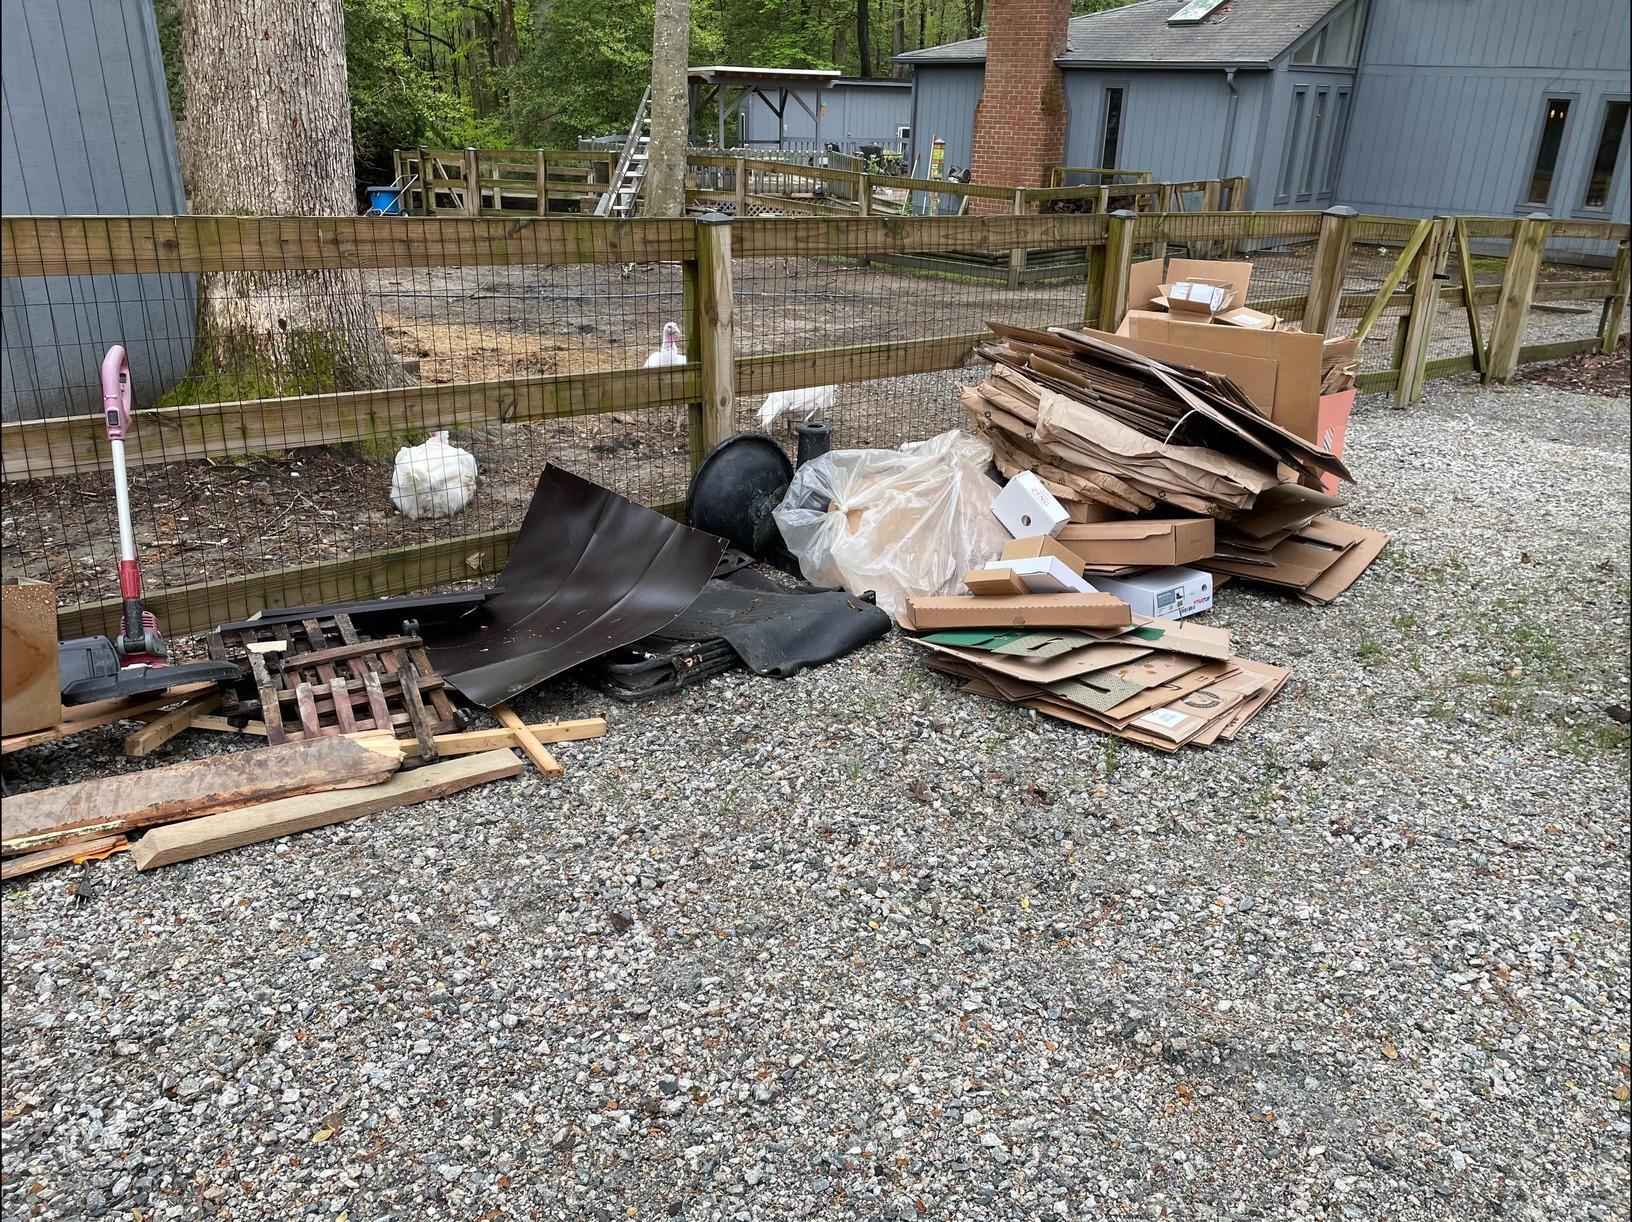 Outdoor Debris Removal in Williamsburg, VA - Before Photo